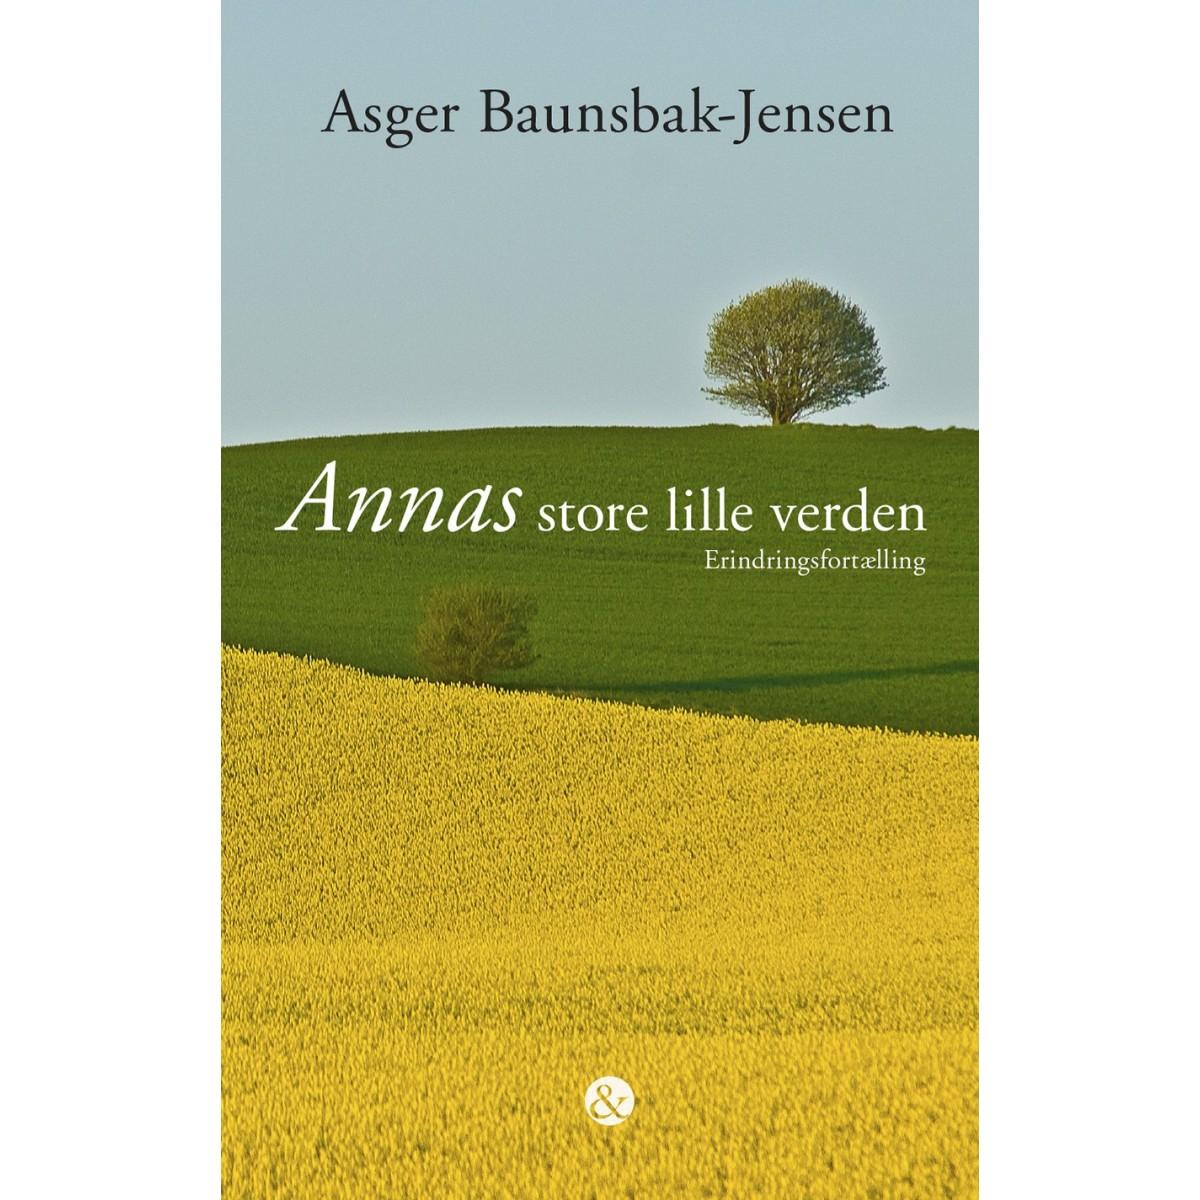 Asger Baunsbak-Jensen: Annas store lille verden